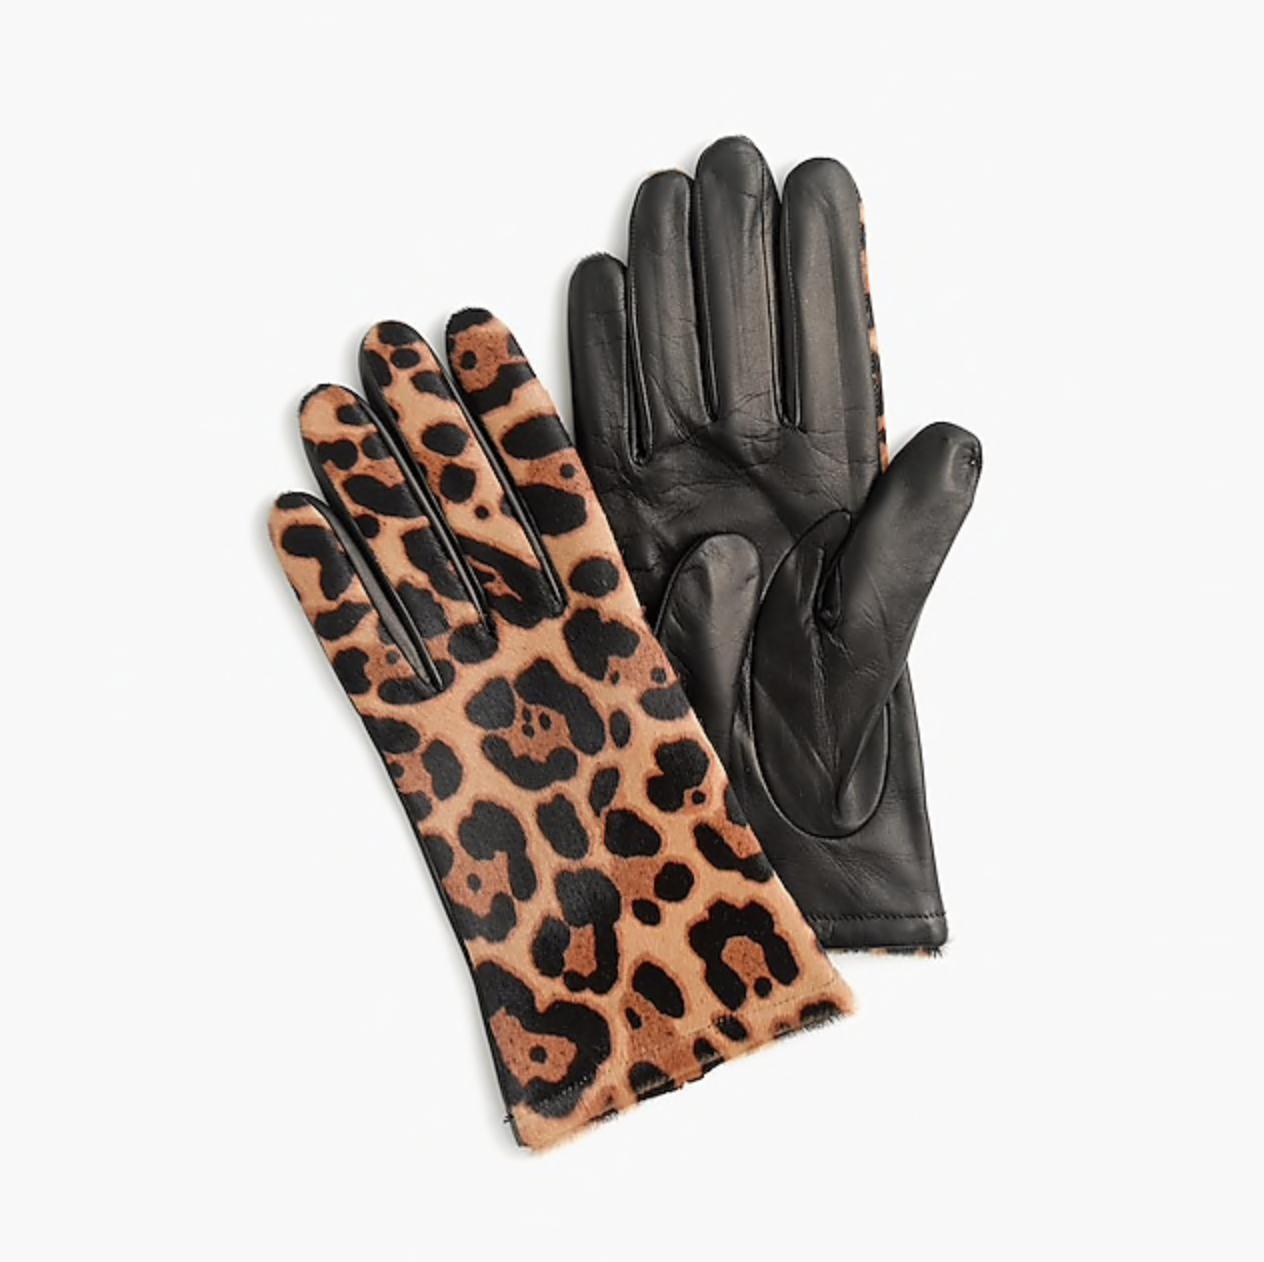 J.Crew Italian Calf Hair and Leather Gloves